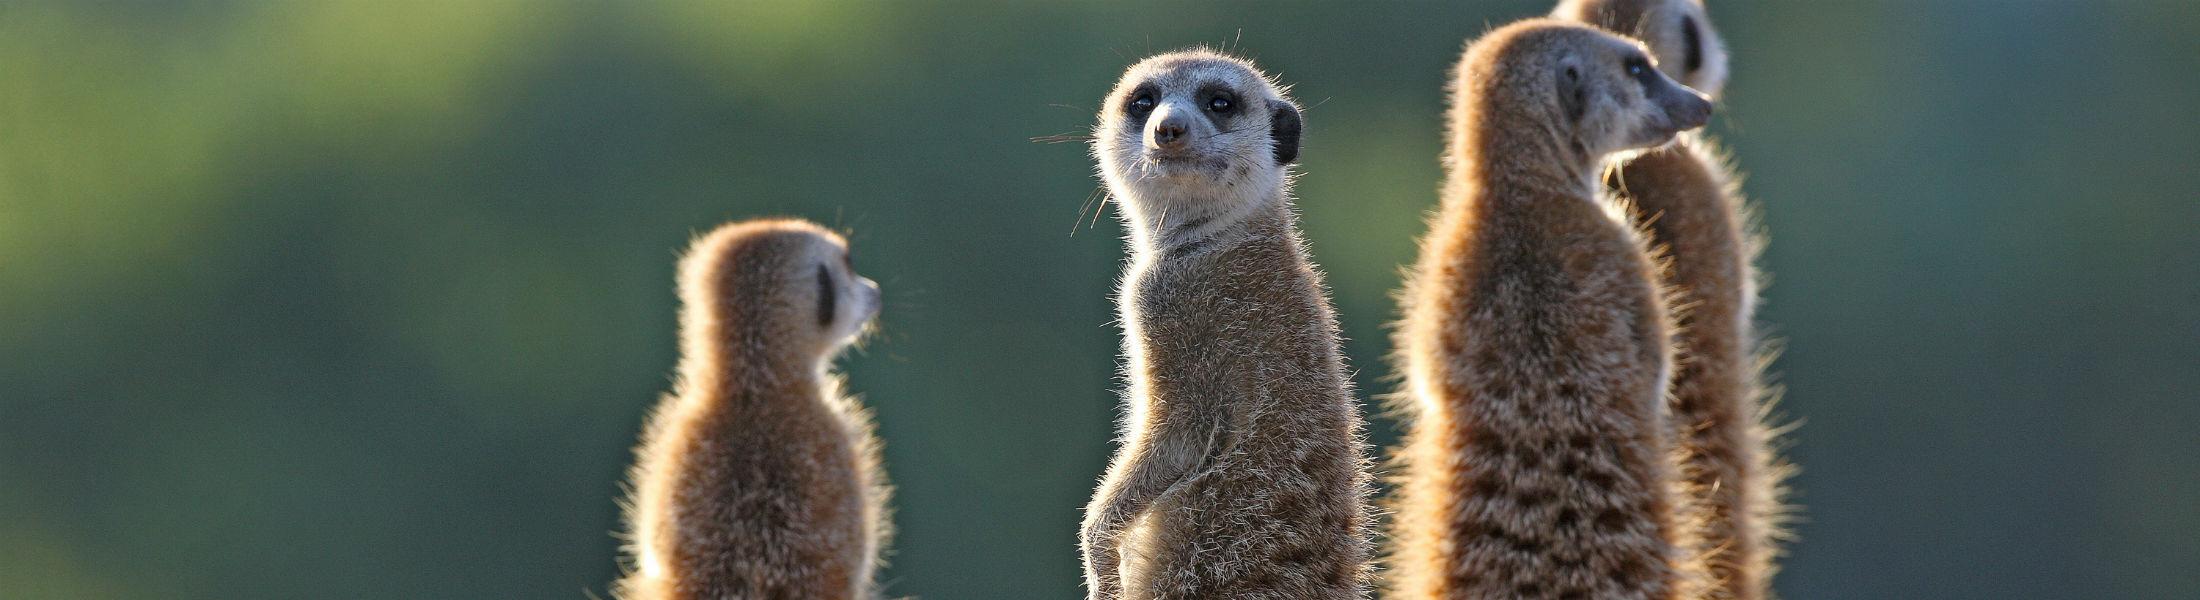 Meerkats looking at camera